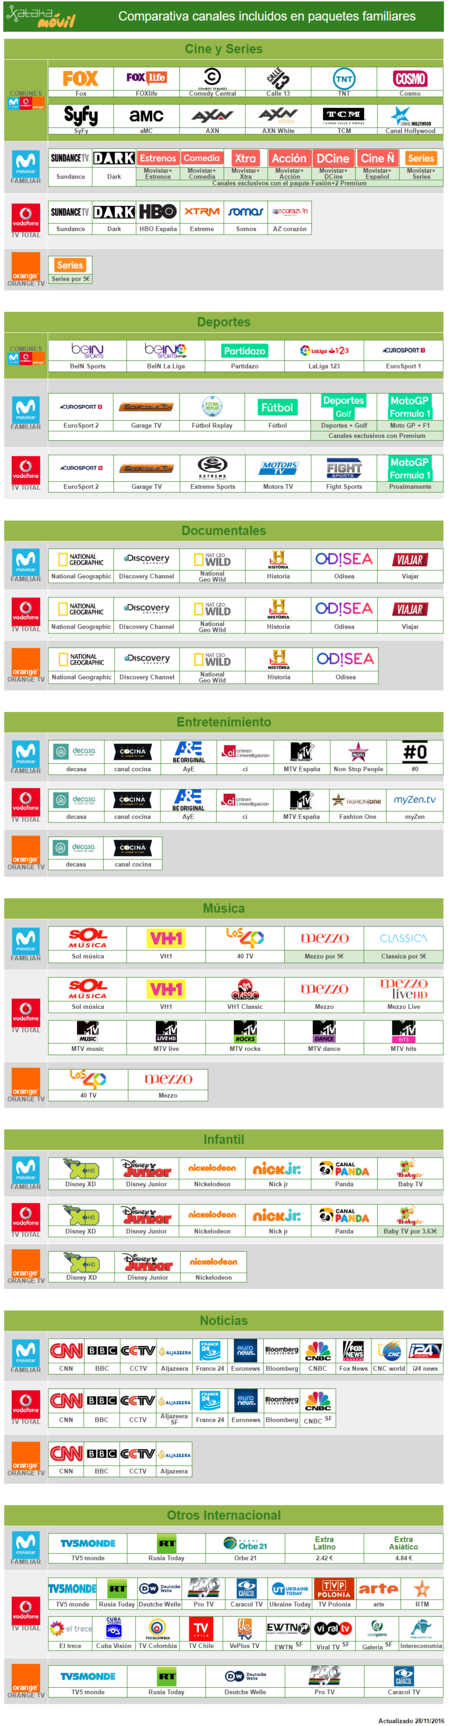 Comparativa Canales Television Paquete Mas Completo